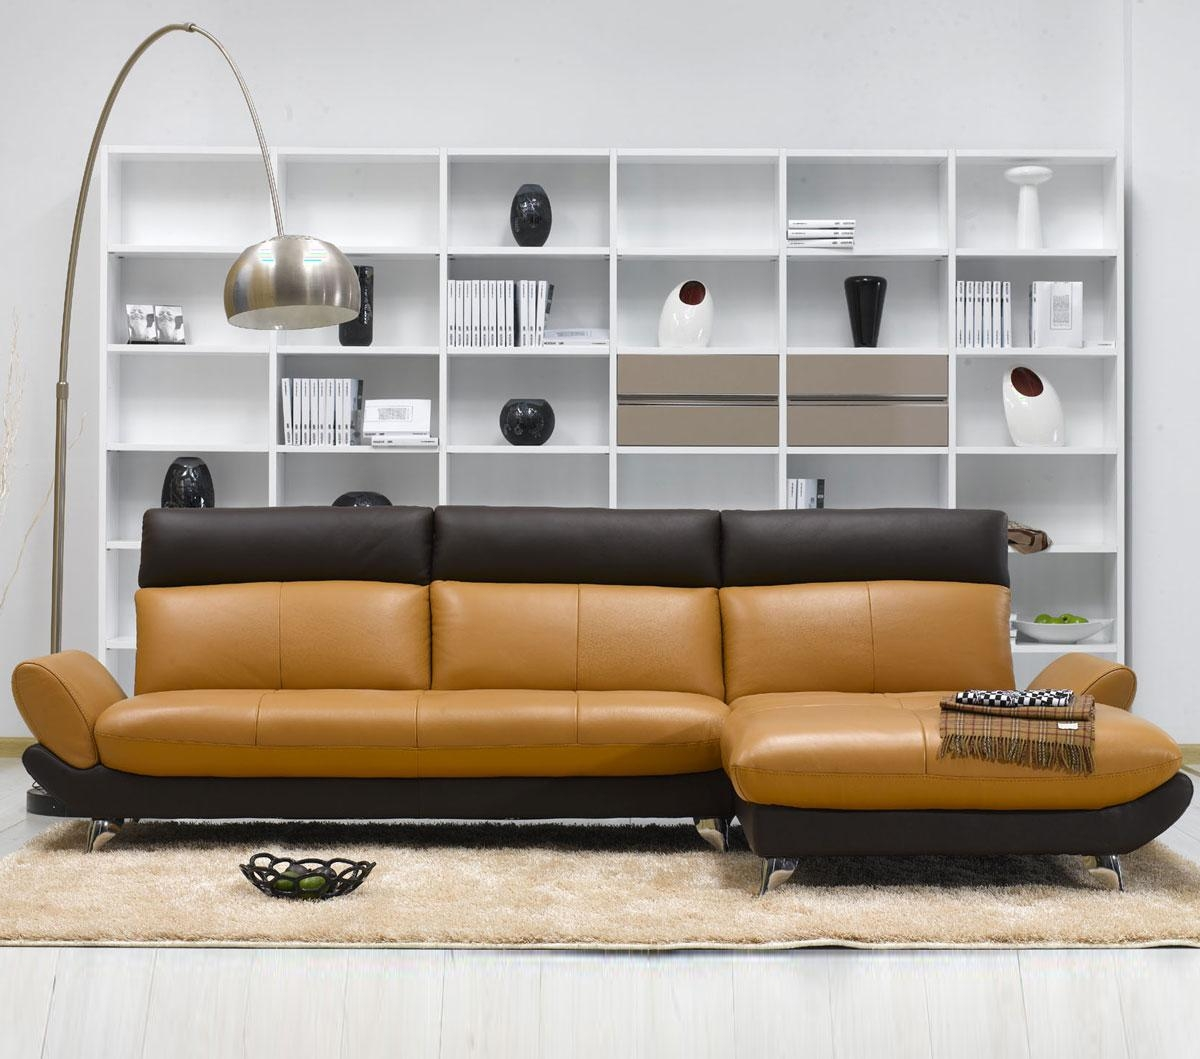 tosh furniture dark brown sofa set pottery barn slipcovered 20 best ideas carmel leather sofas